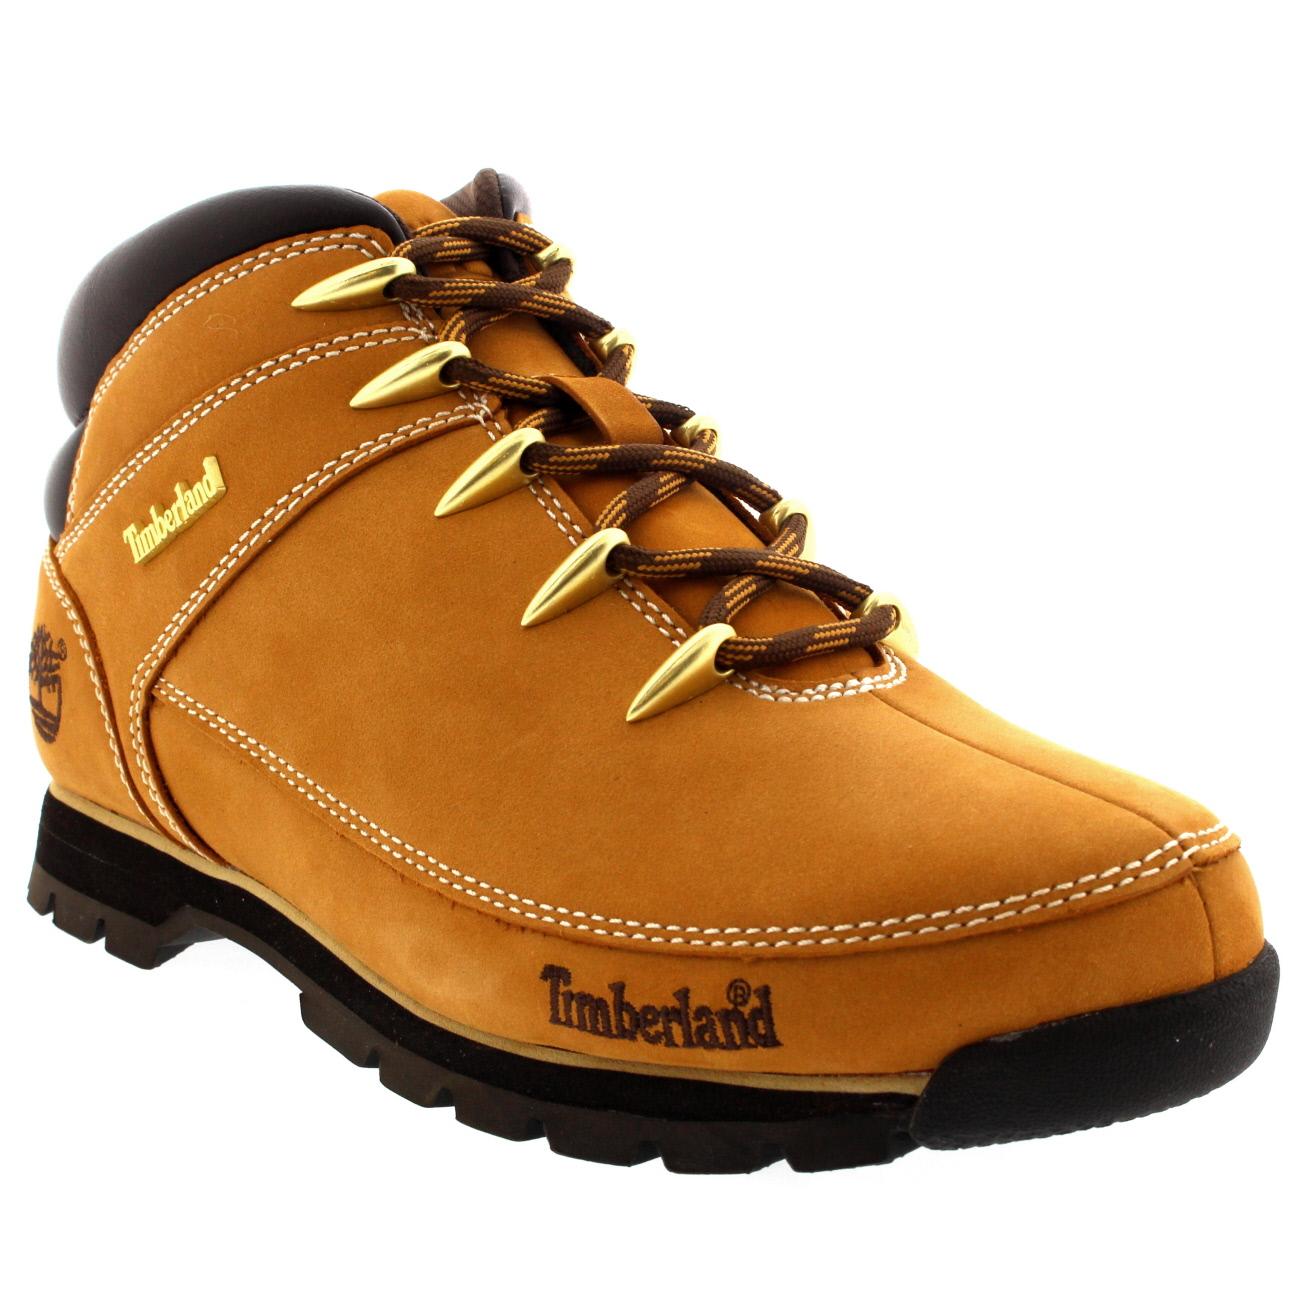 mens timberland boots uk